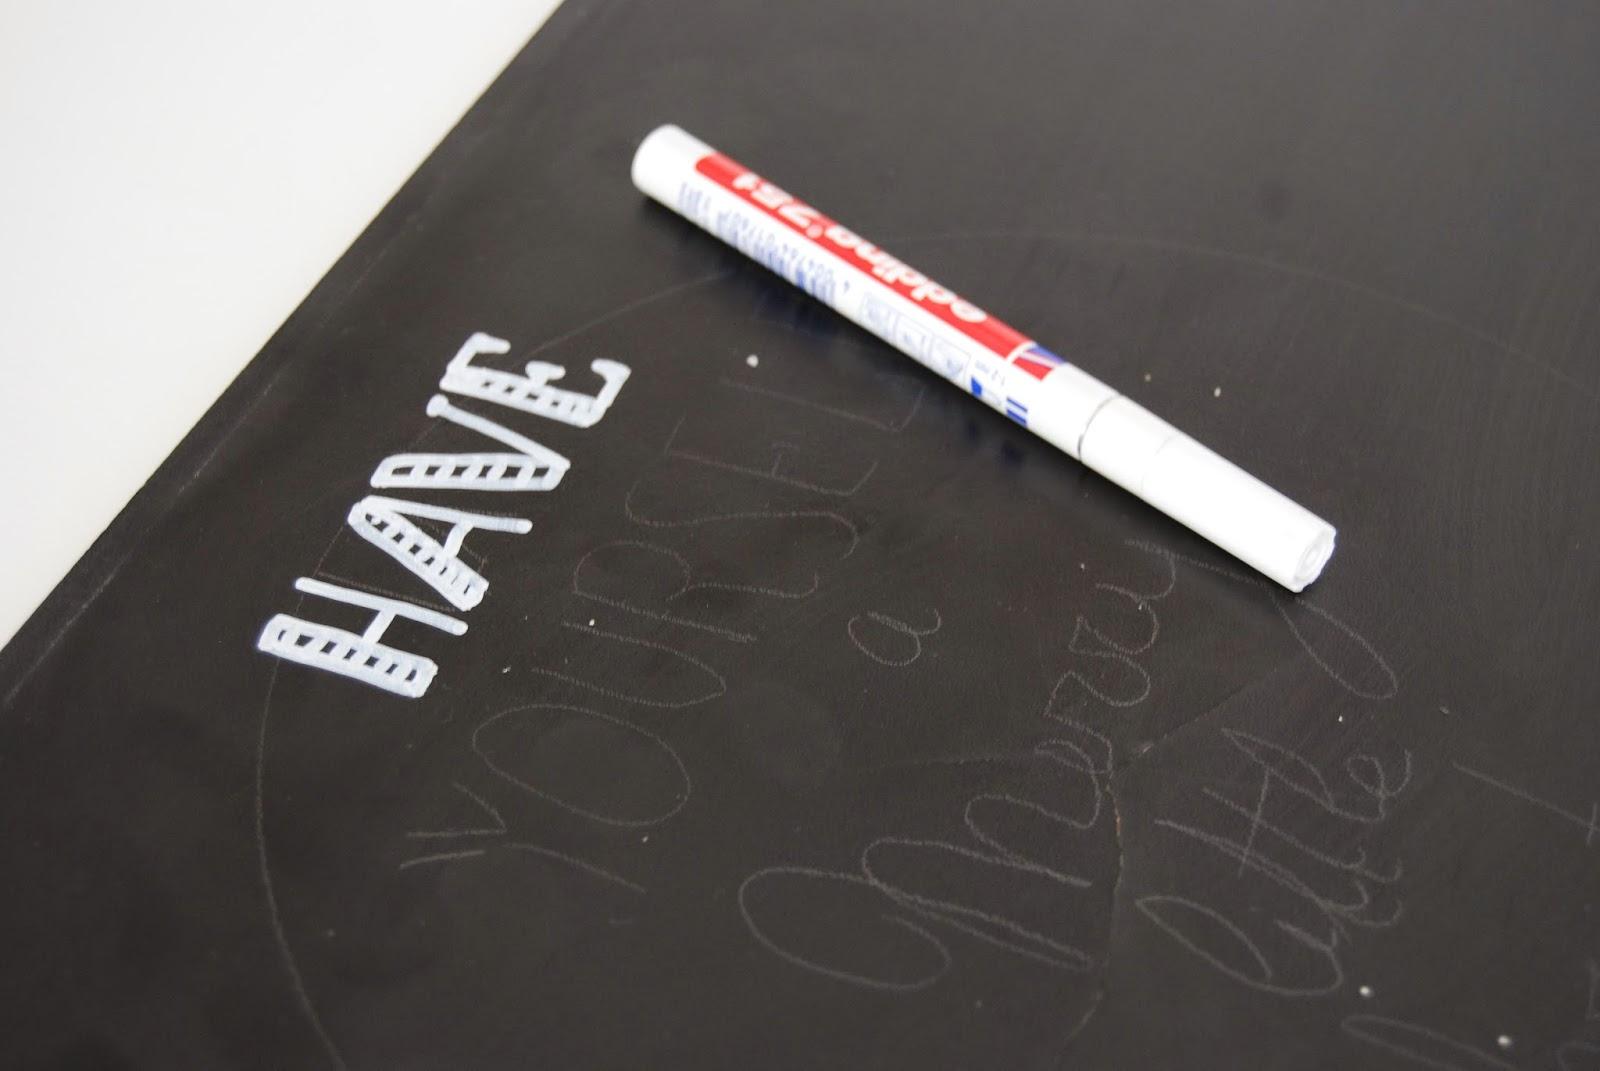 http://sosunnyblog.blogspot.com.es/2014/12/la-creatividad-el-rotulador-de-tiza-y.html